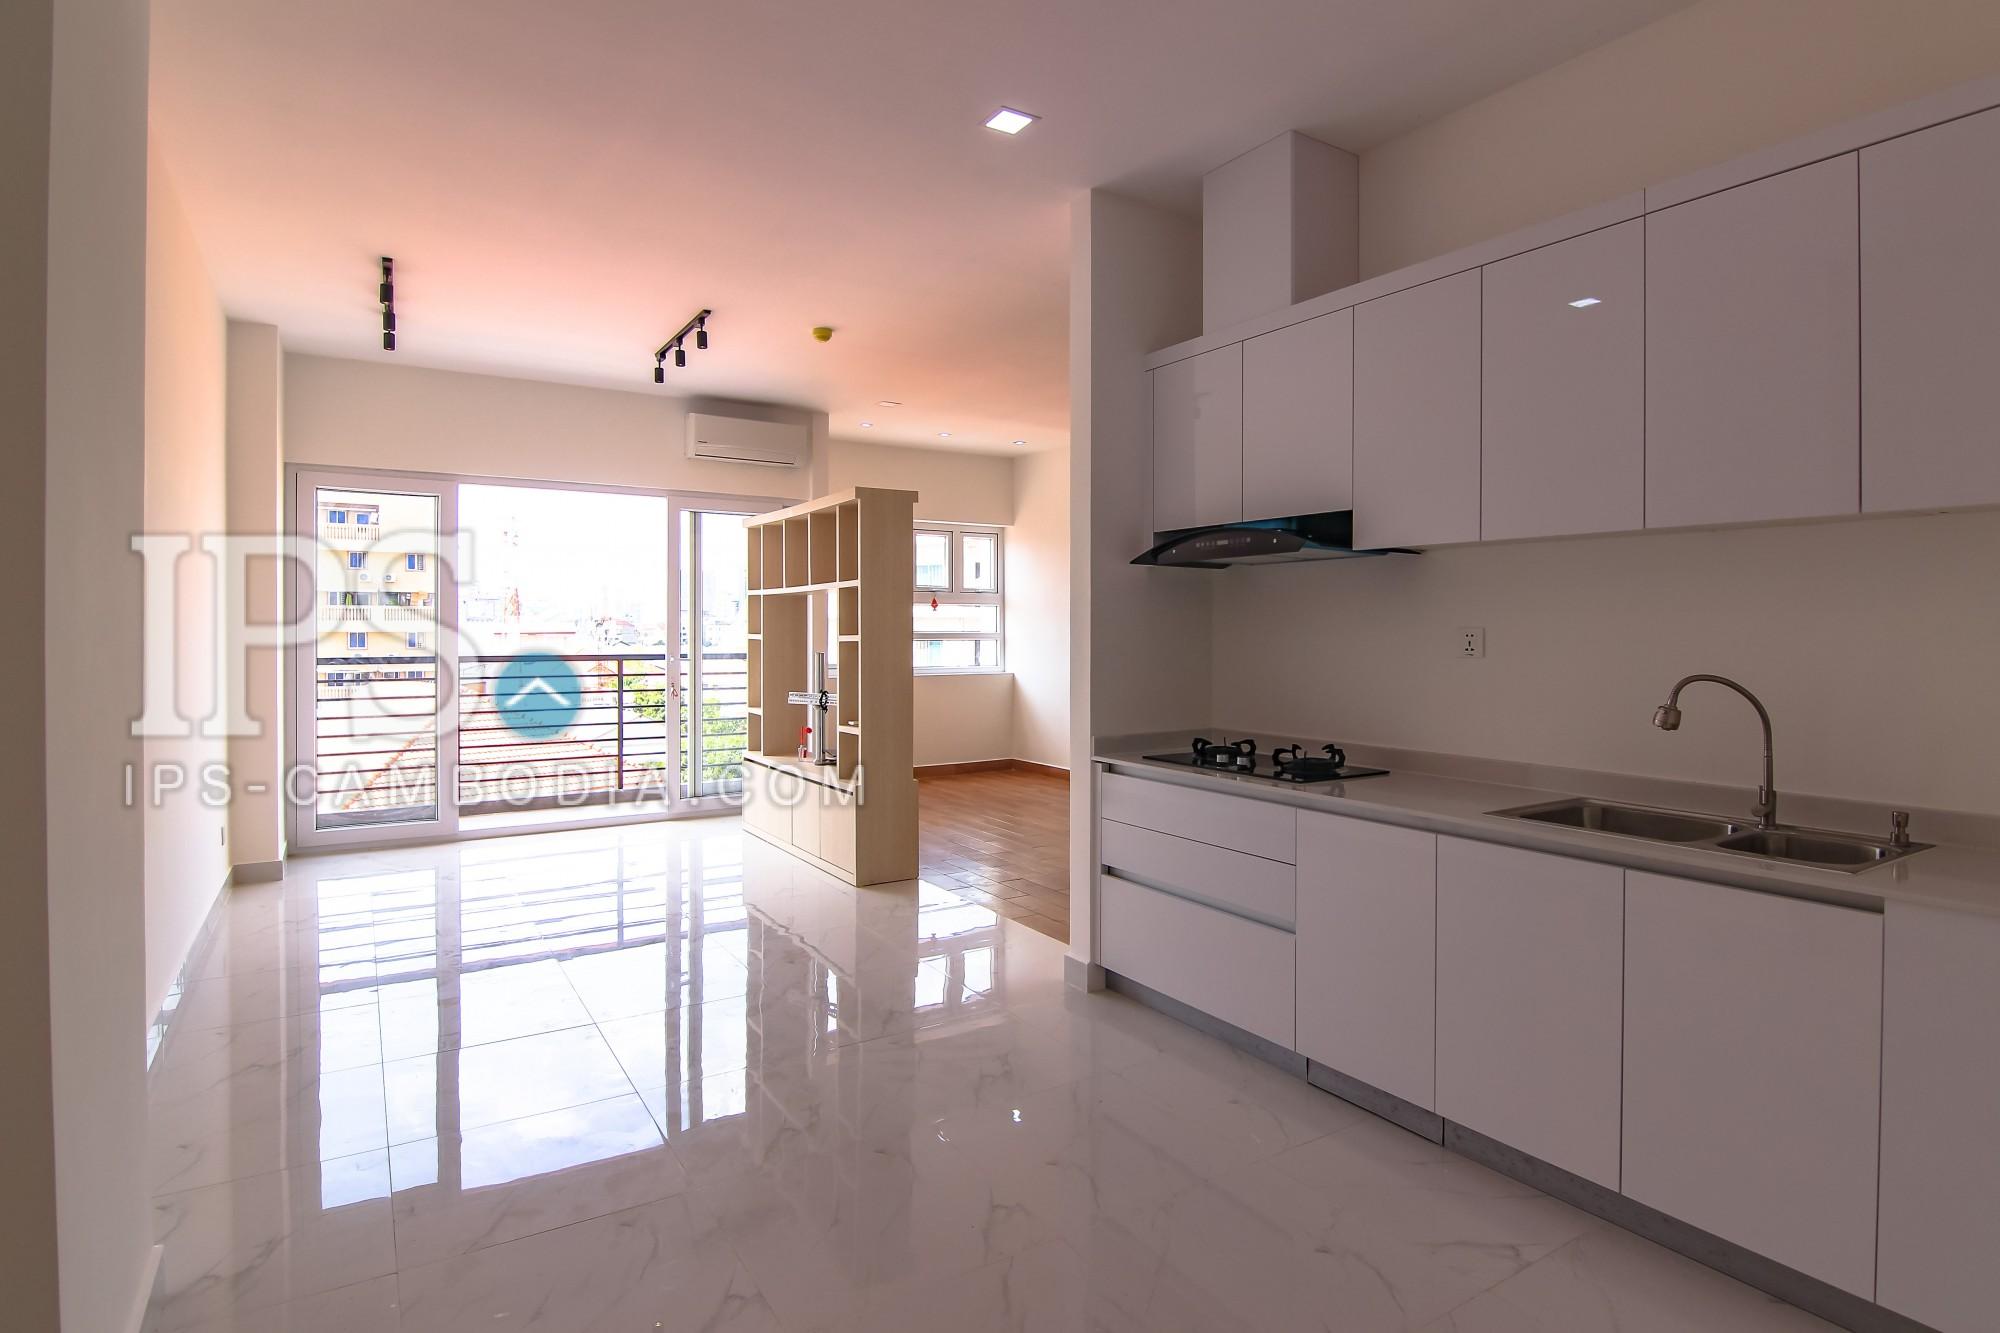 Studio Room Apartment for Rent - Boeung Tumpon